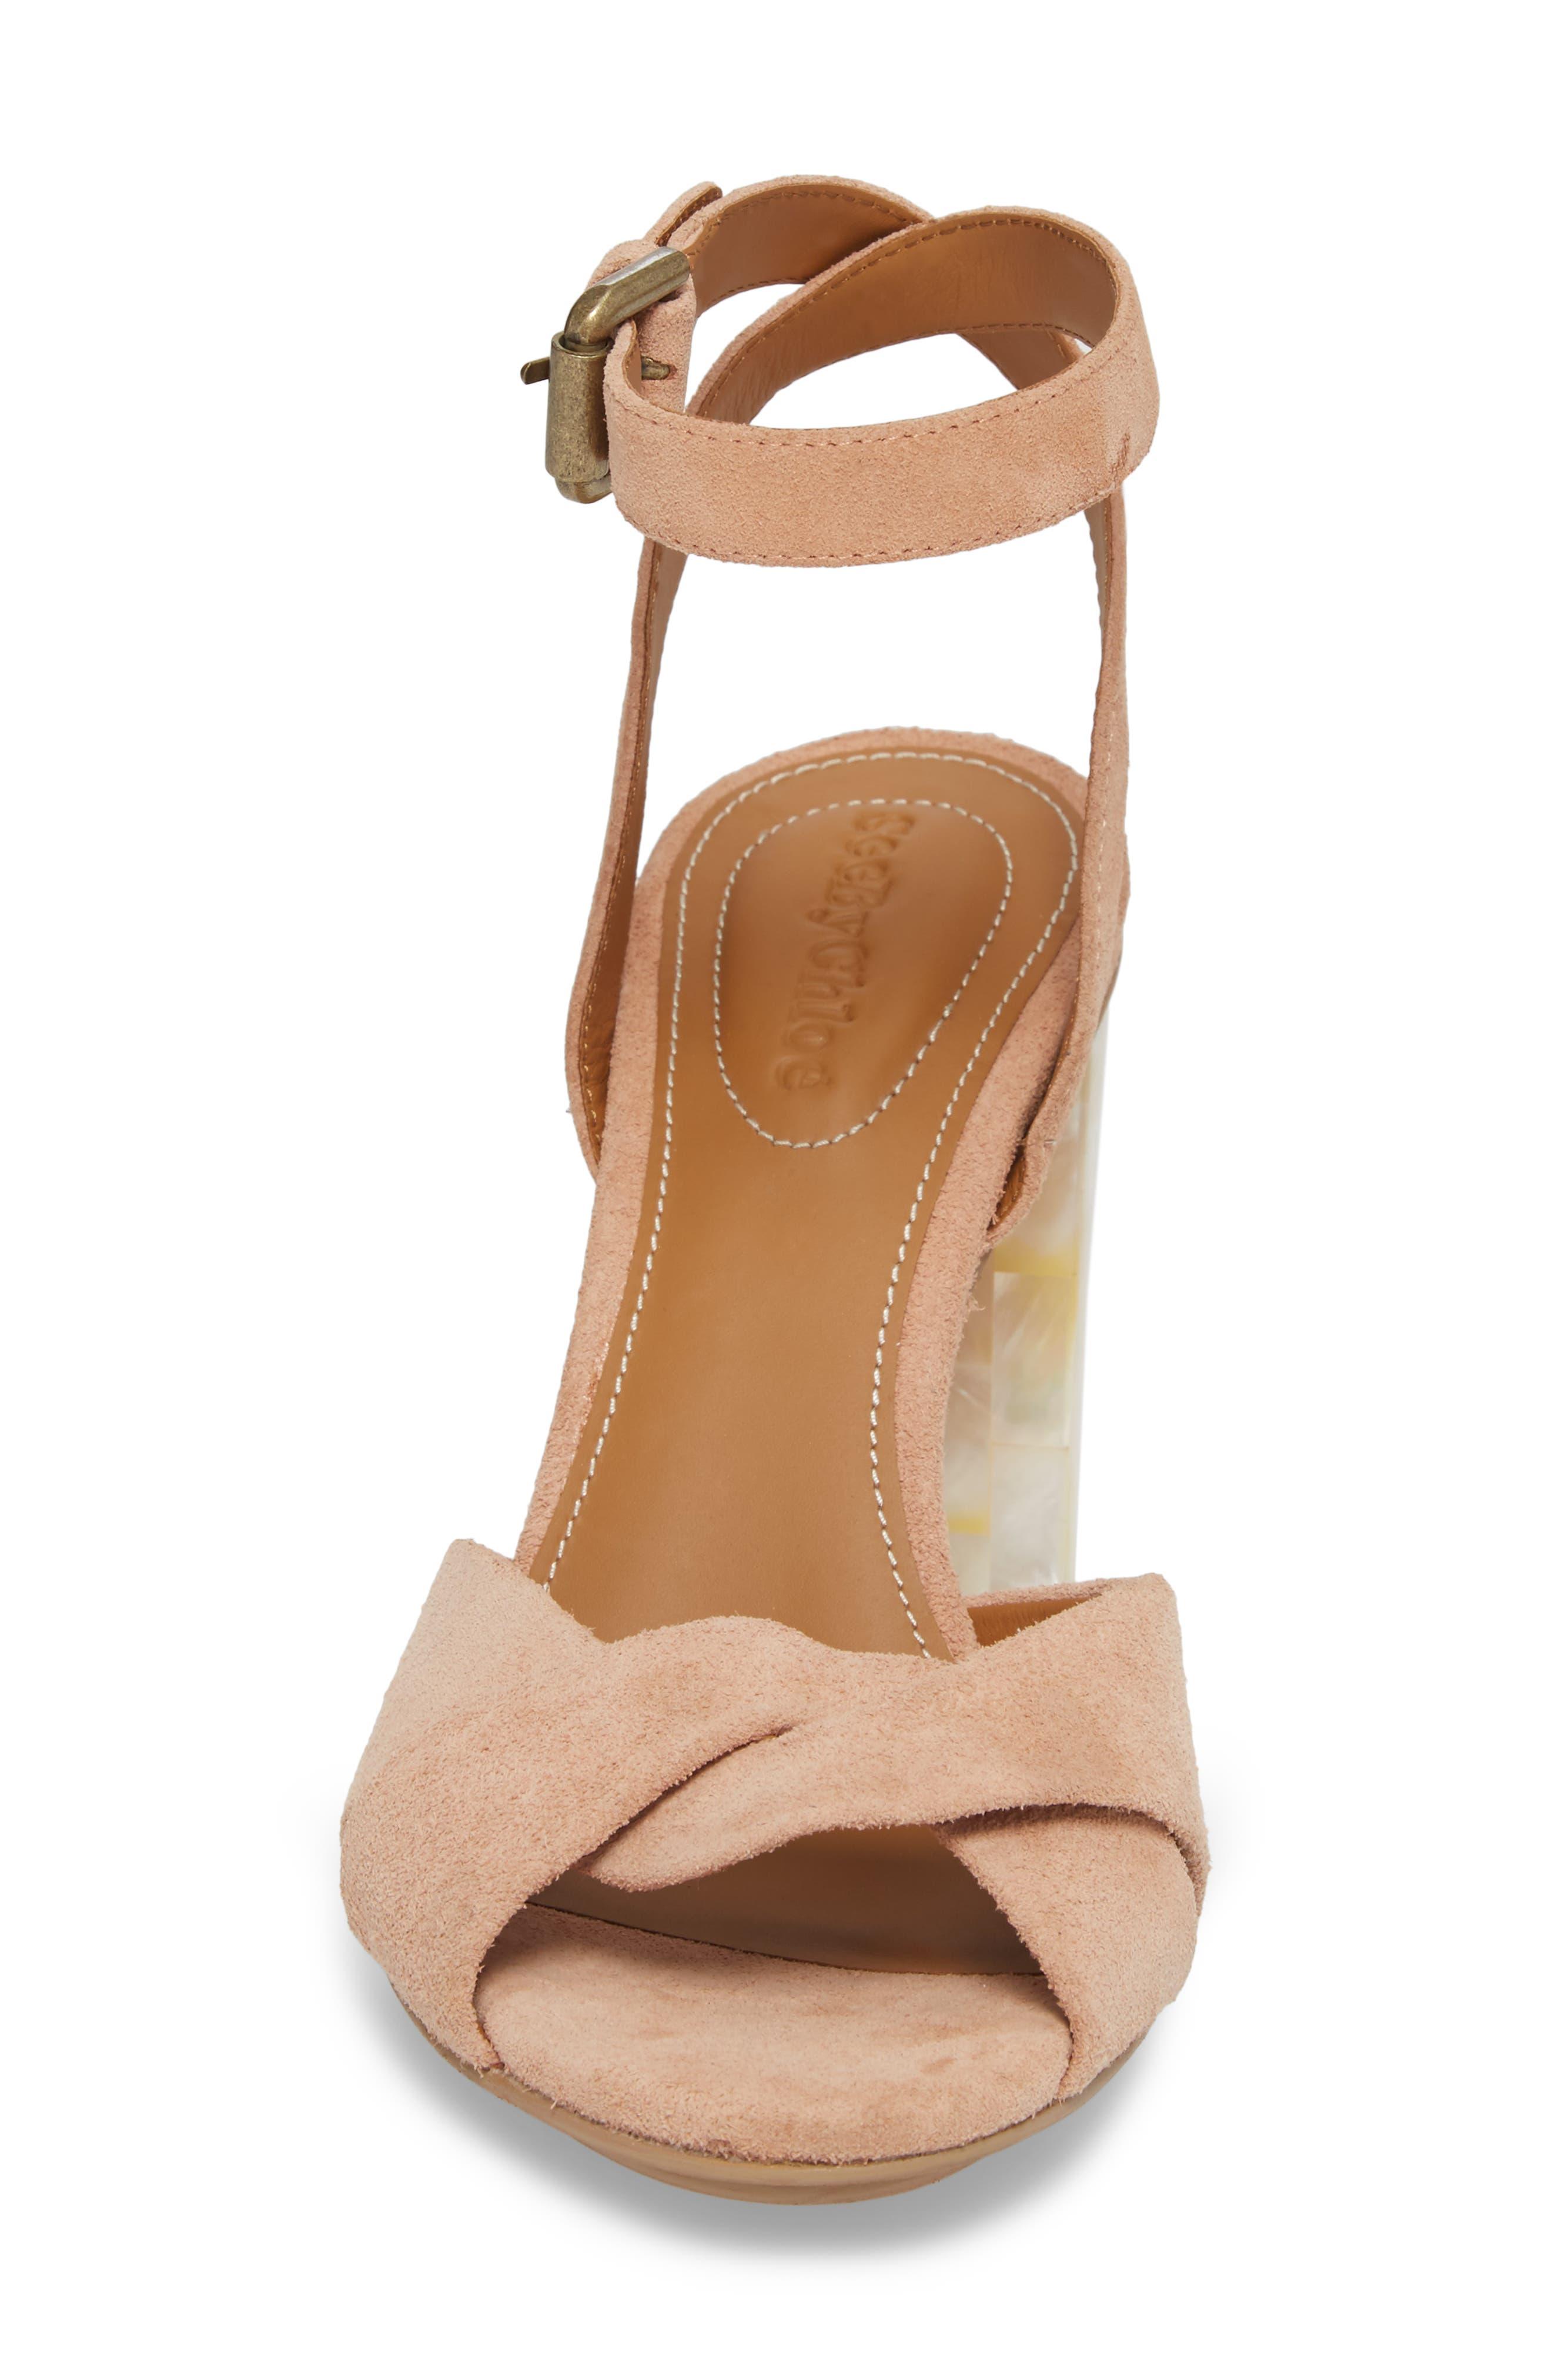 Isida Block Heel Sandal,                             Alternate thumbnail 4, color,                             210